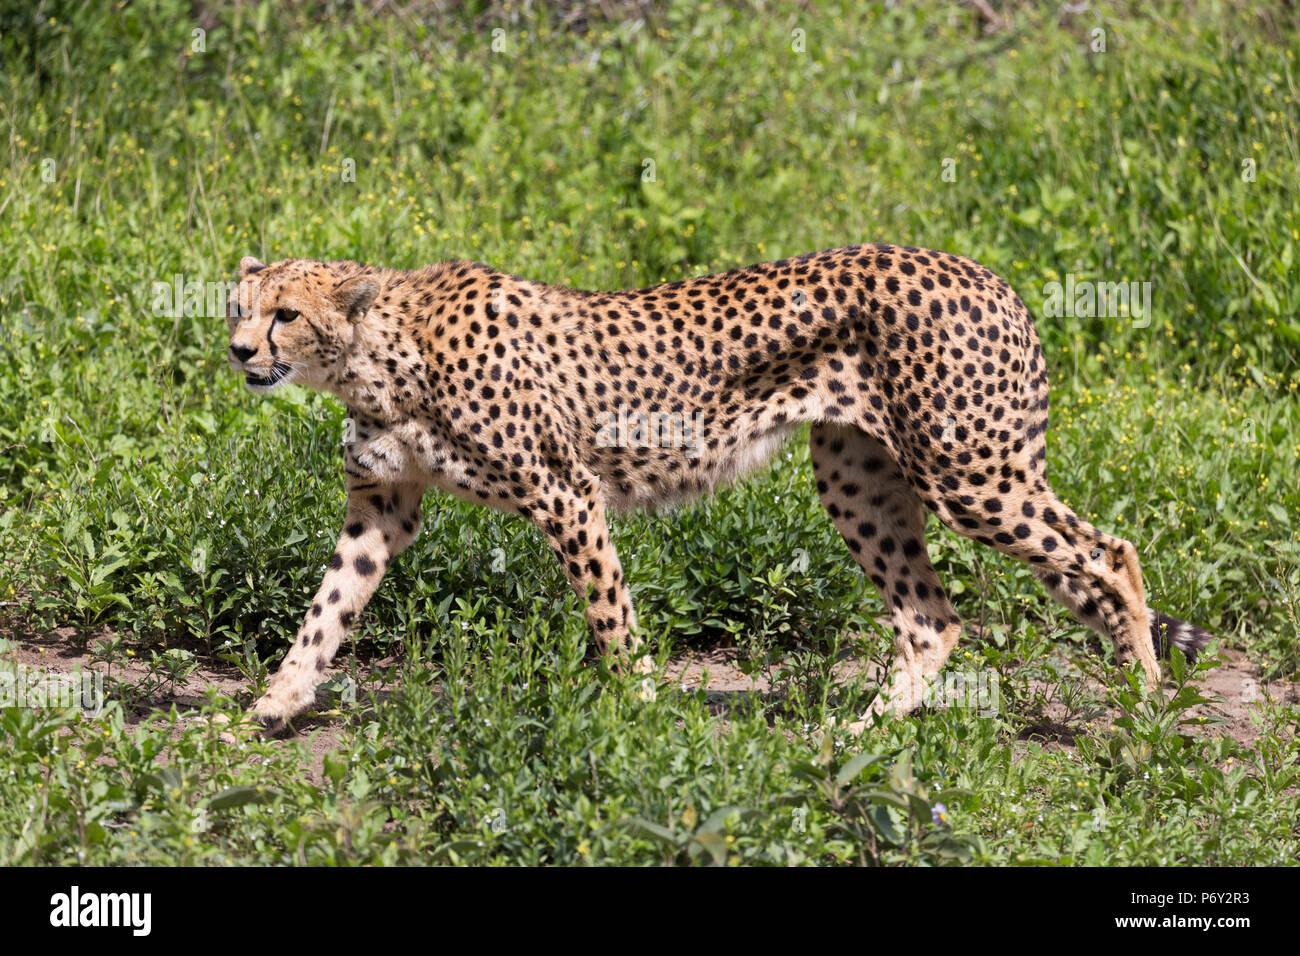 A cheetah walks across the grasslands of the Serengeti, Serengeti, Tanzania - Stock Image